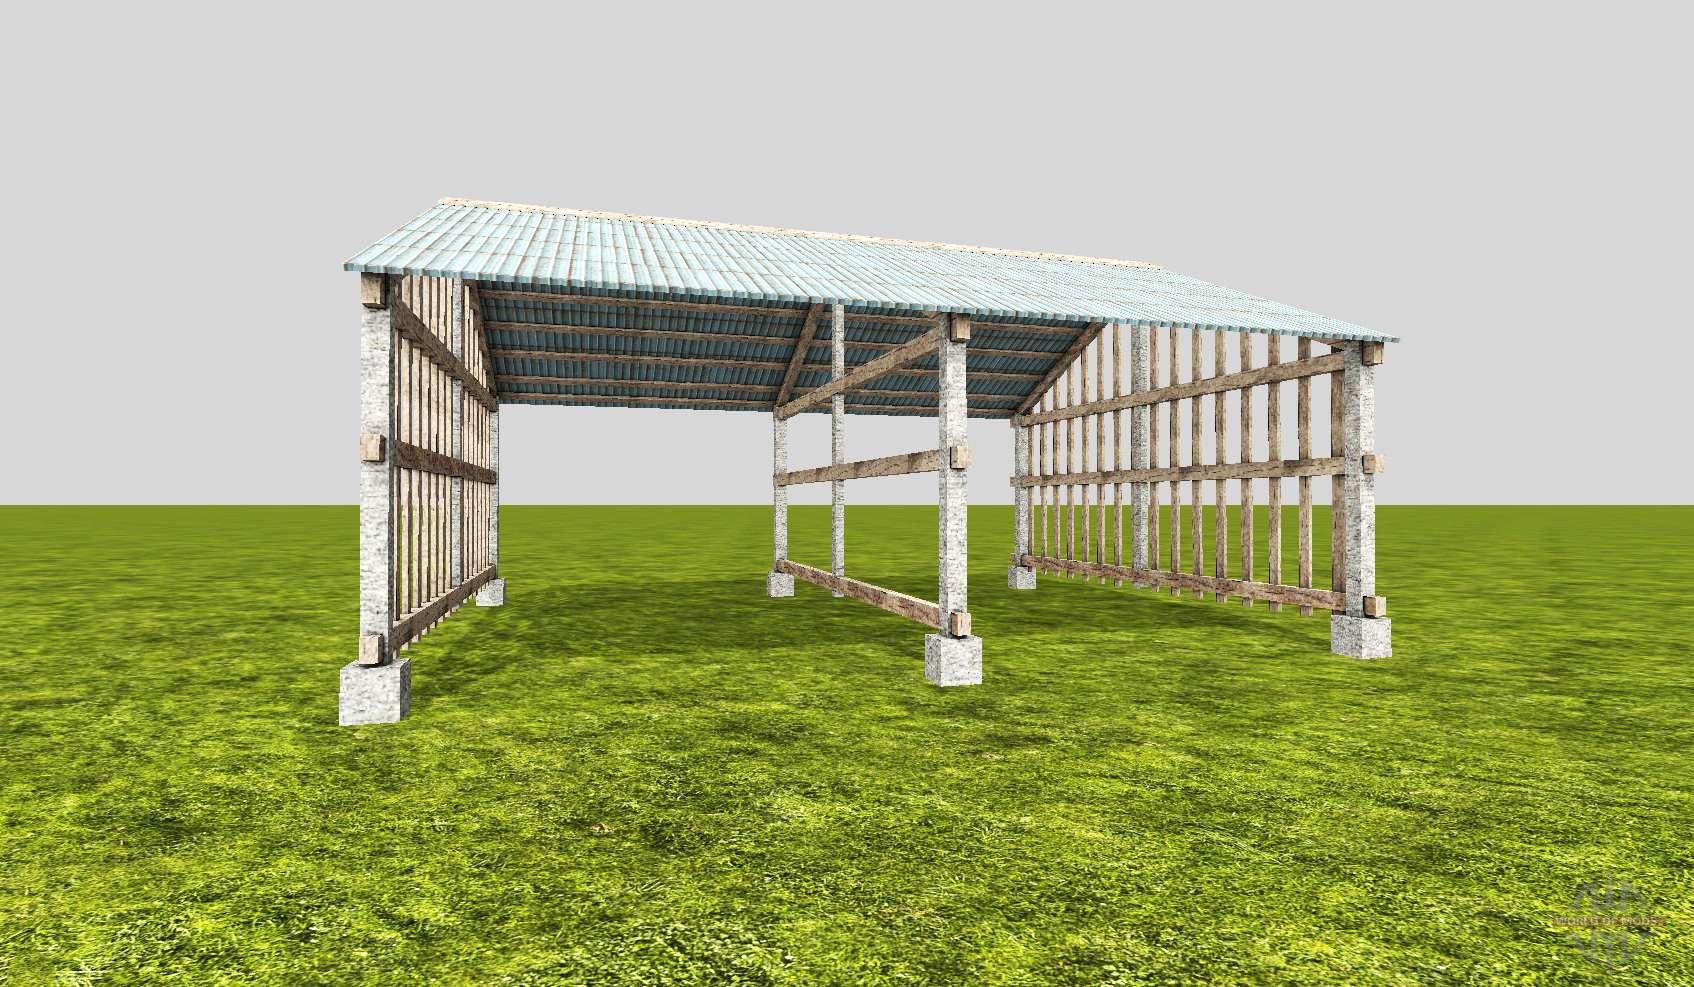 Carport sawmill para farming simulator 2015 - Simulador gastos compra plaza garaje ...